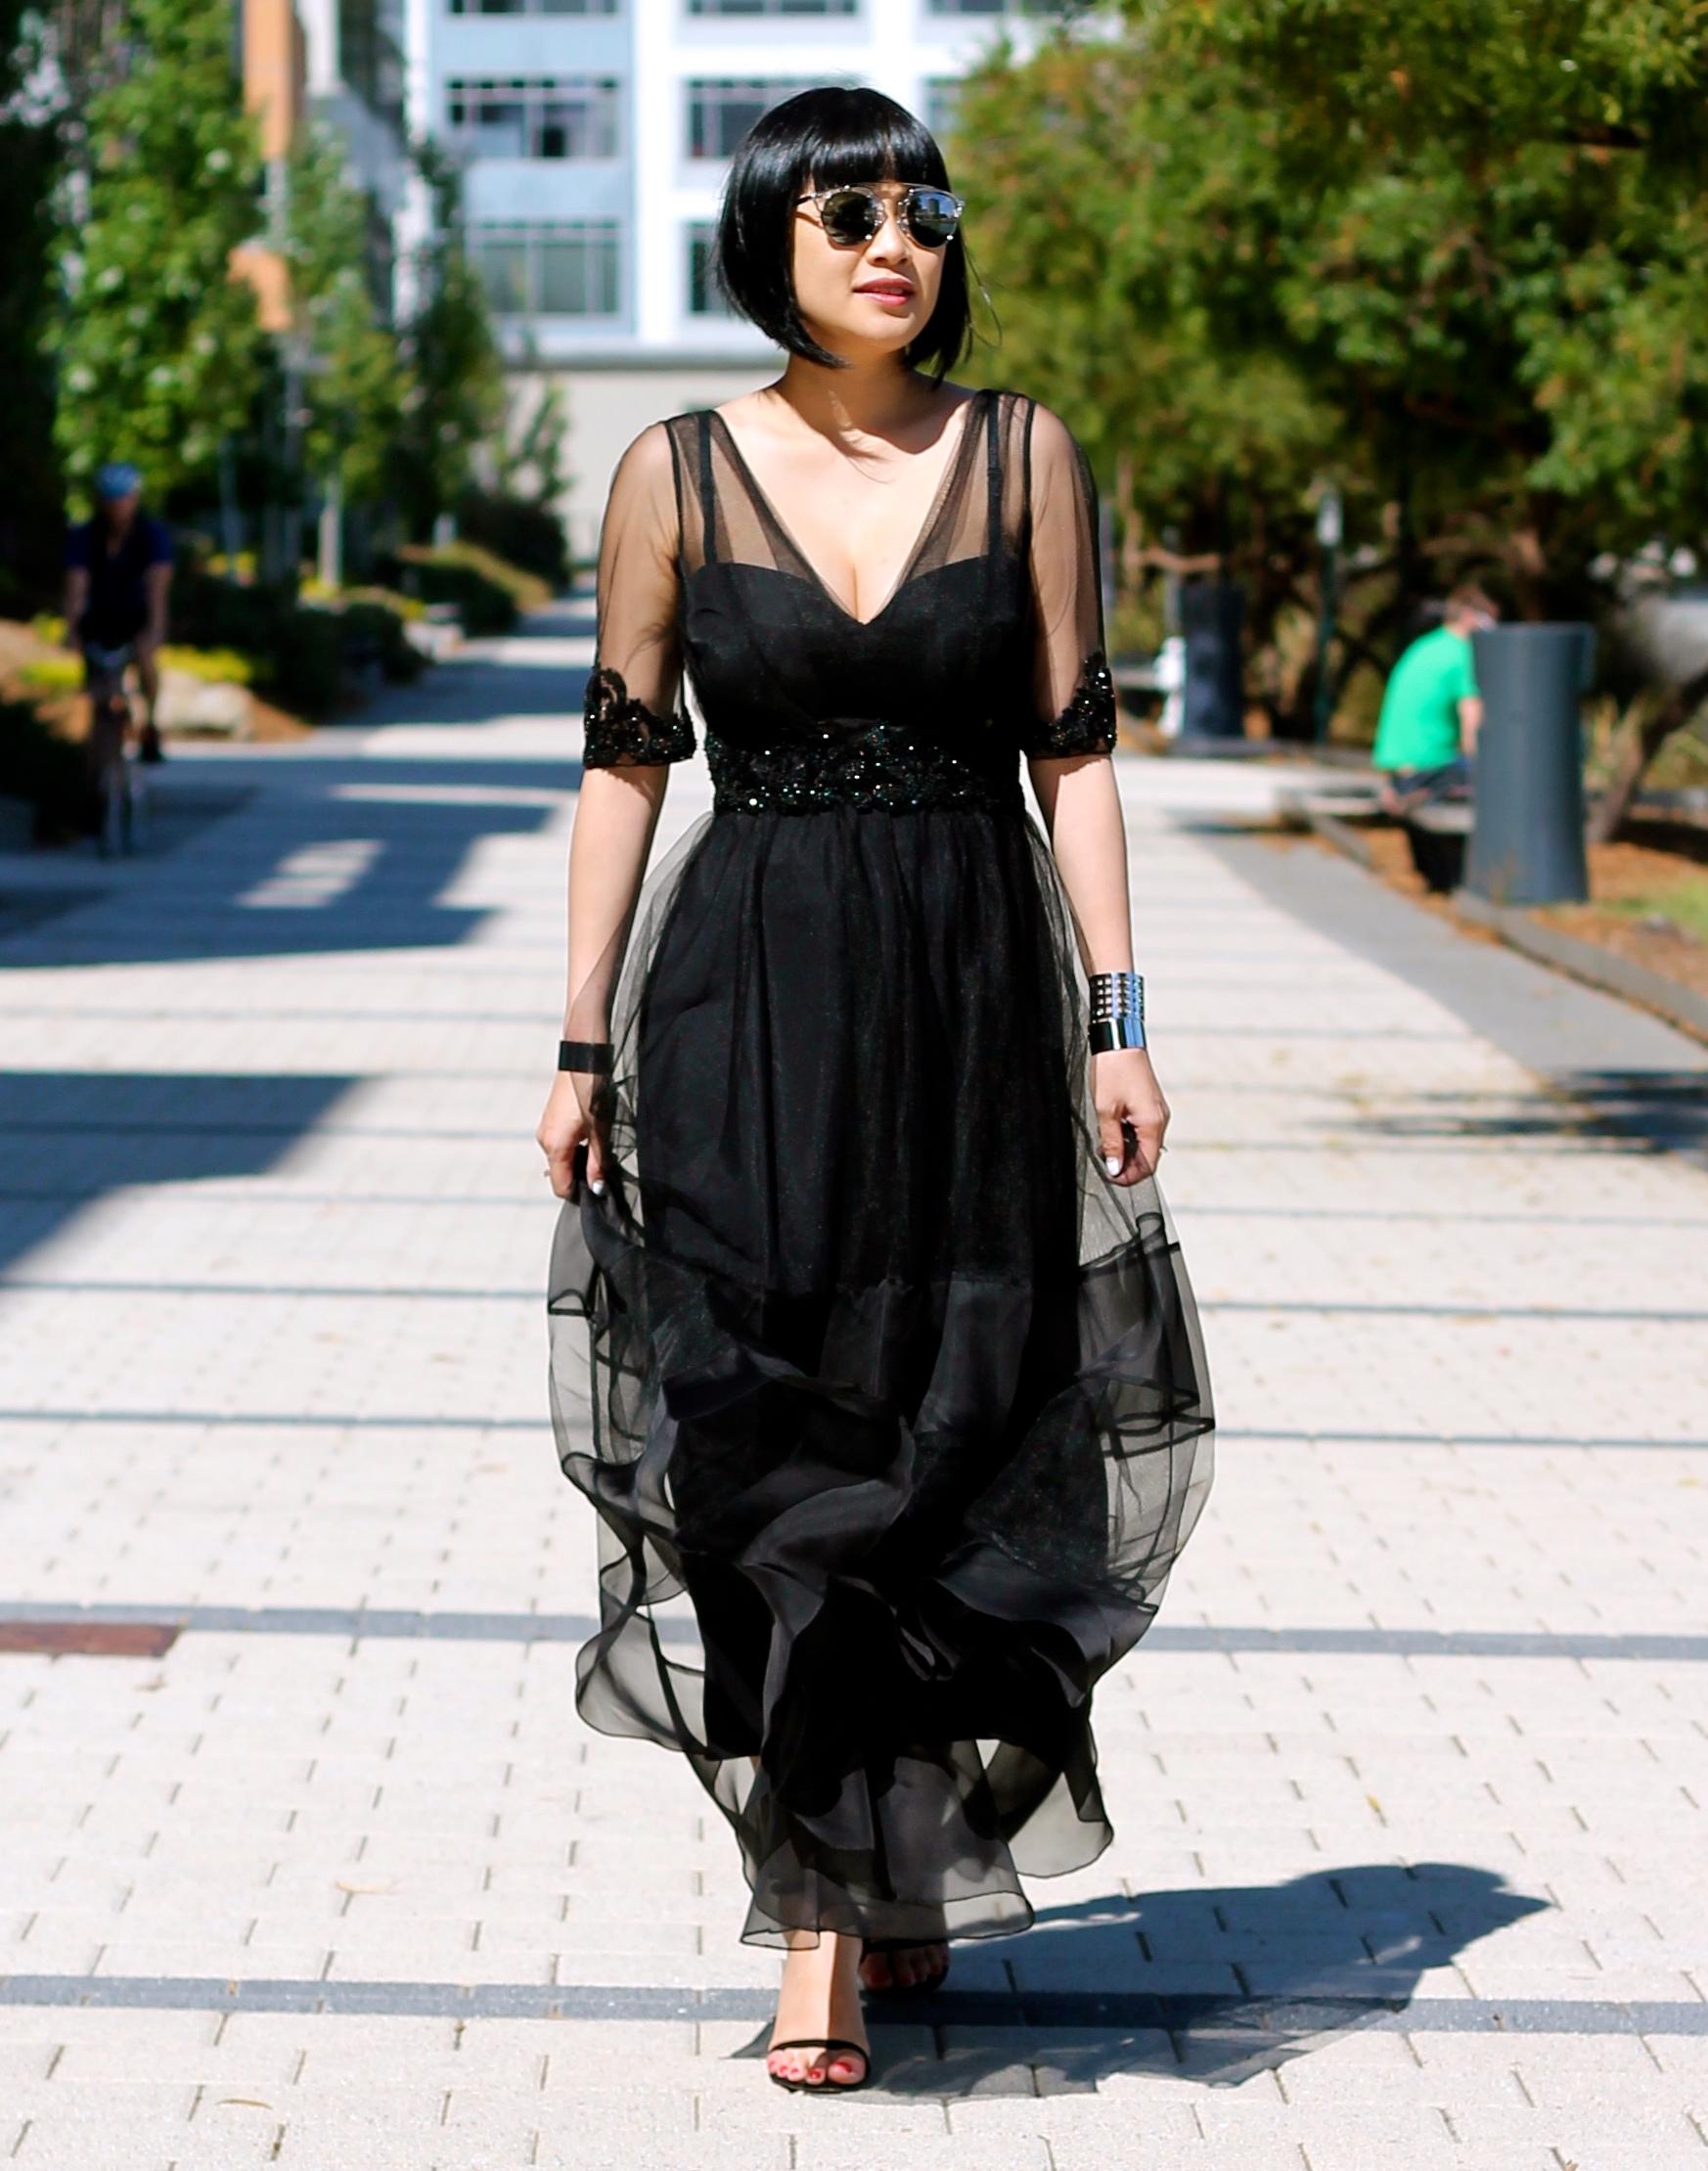 dress c/o Marchesa,  Christian Dior sunglasses ,  Stuart Weitzman shoes ,  Svelte Metals jewelry